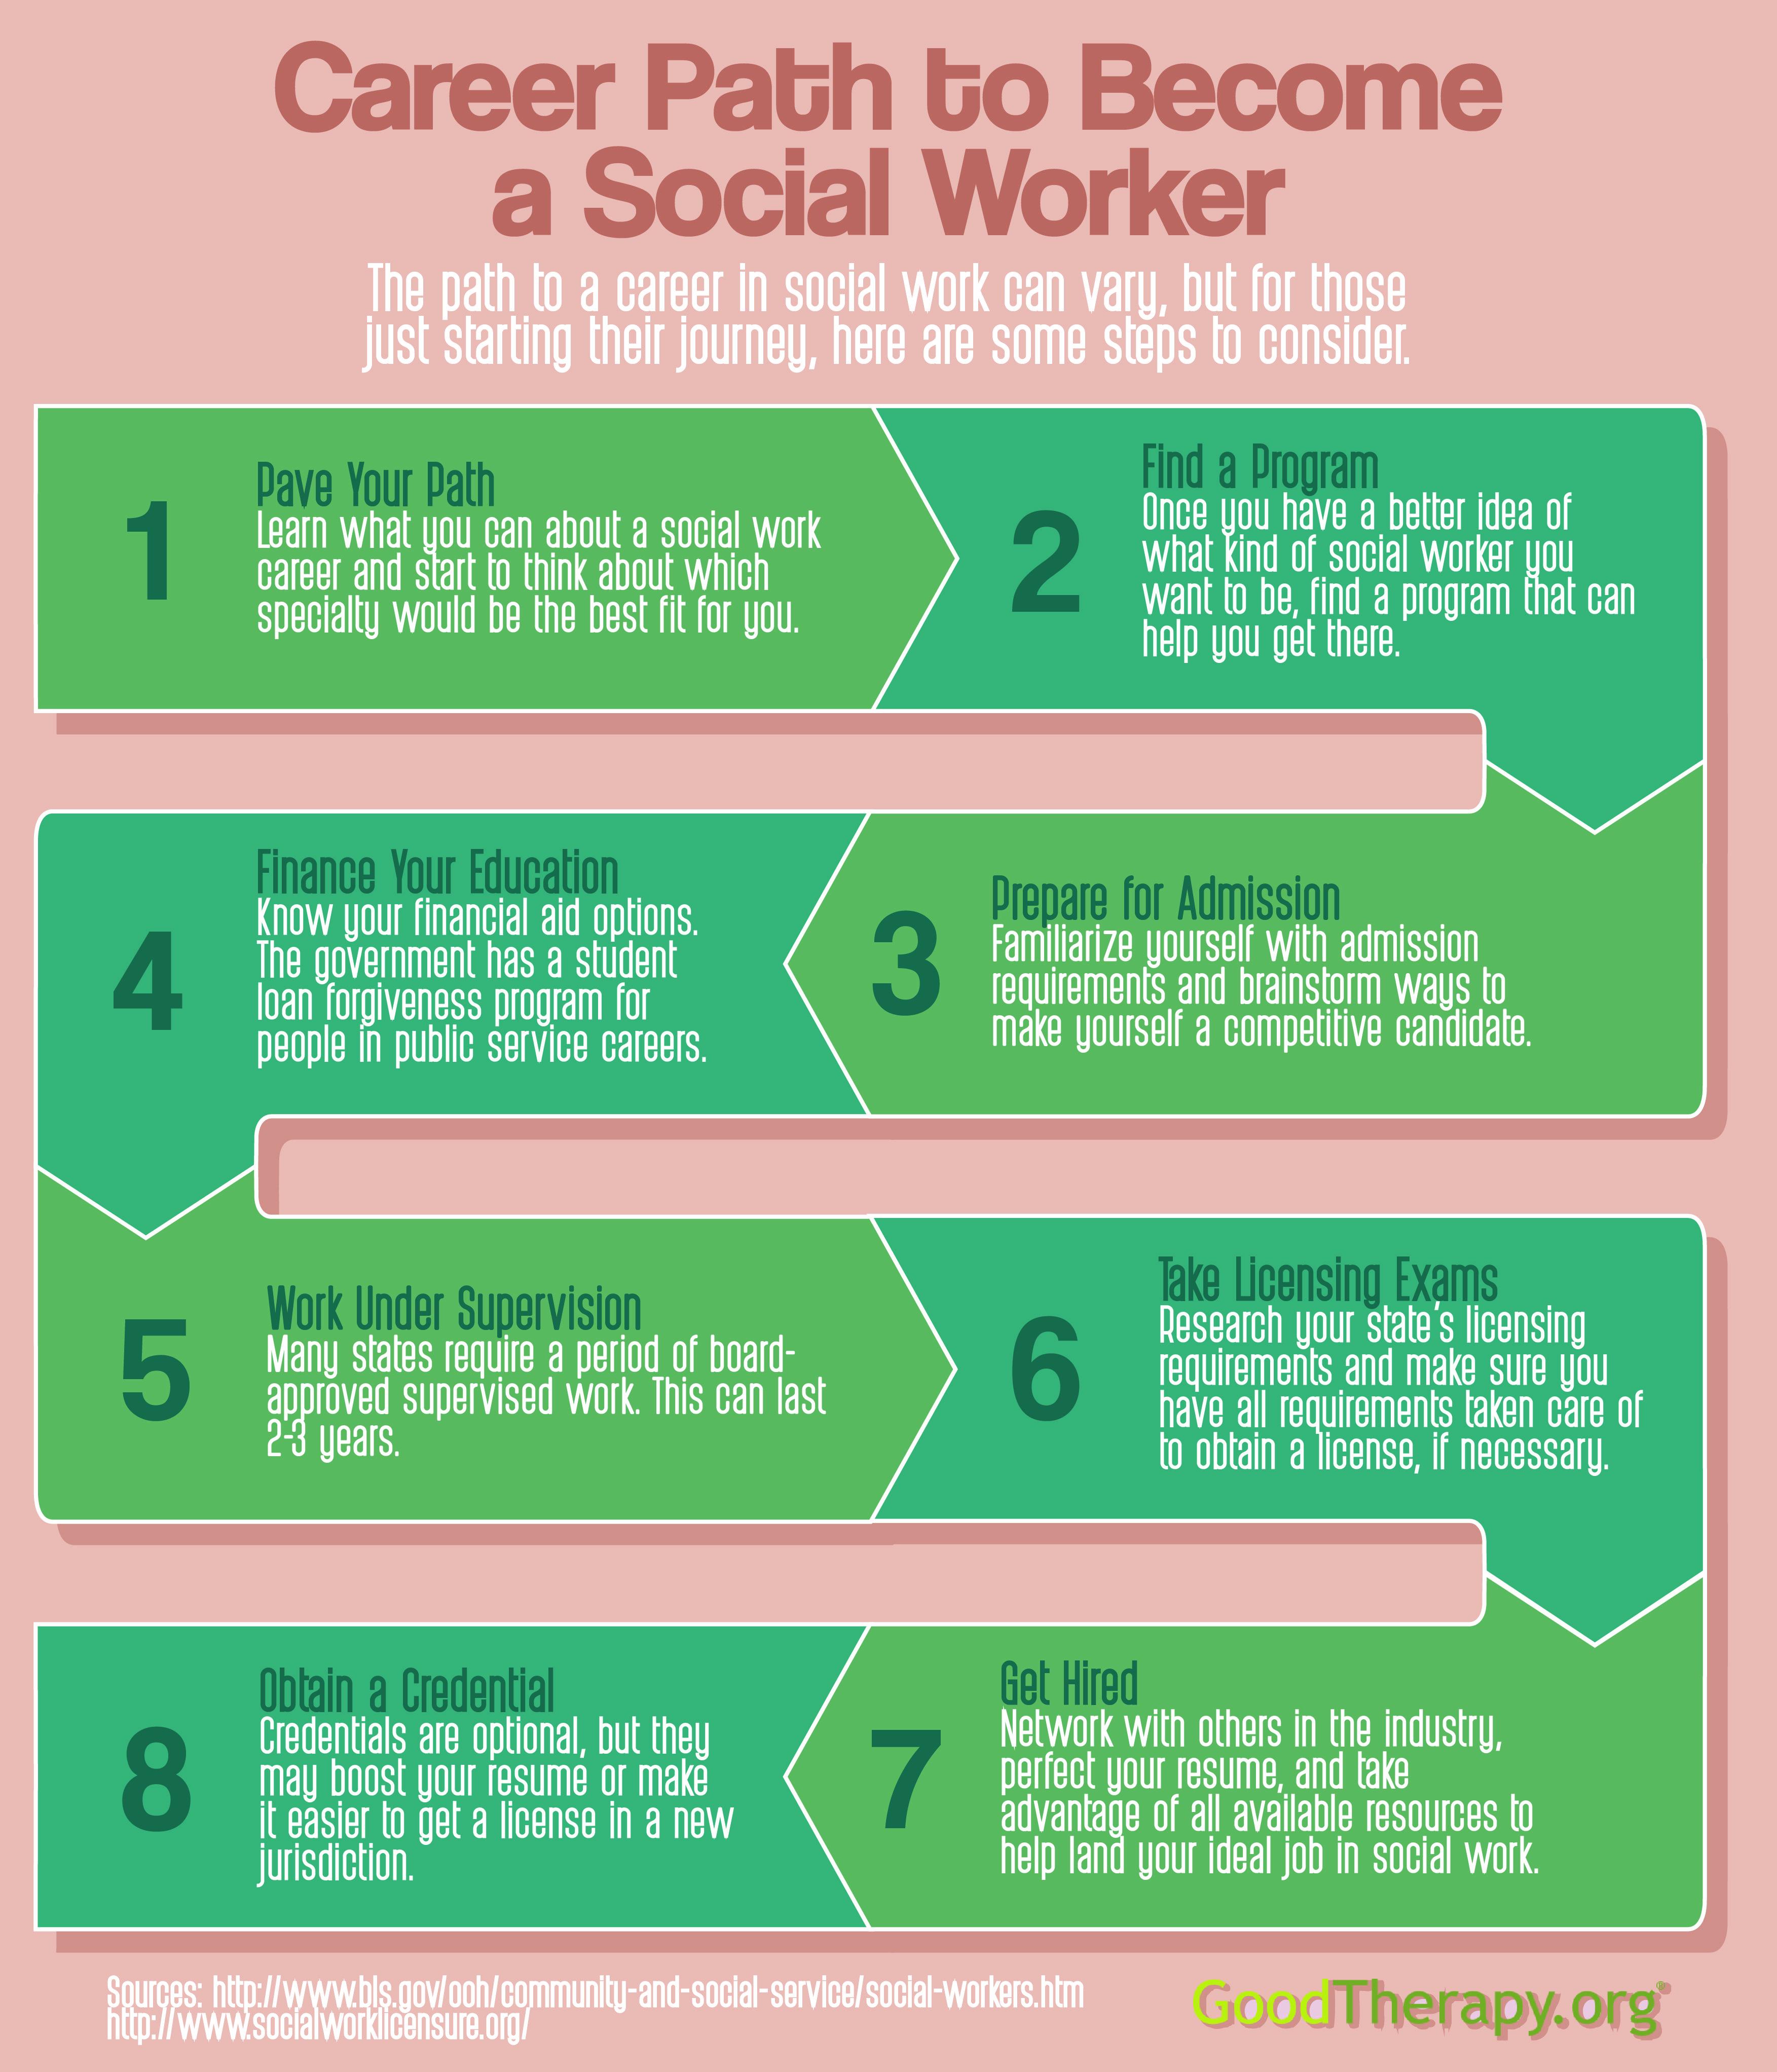 Socialworkmonth Swmonth Socialwork Career Path Social Worker Social Work Month